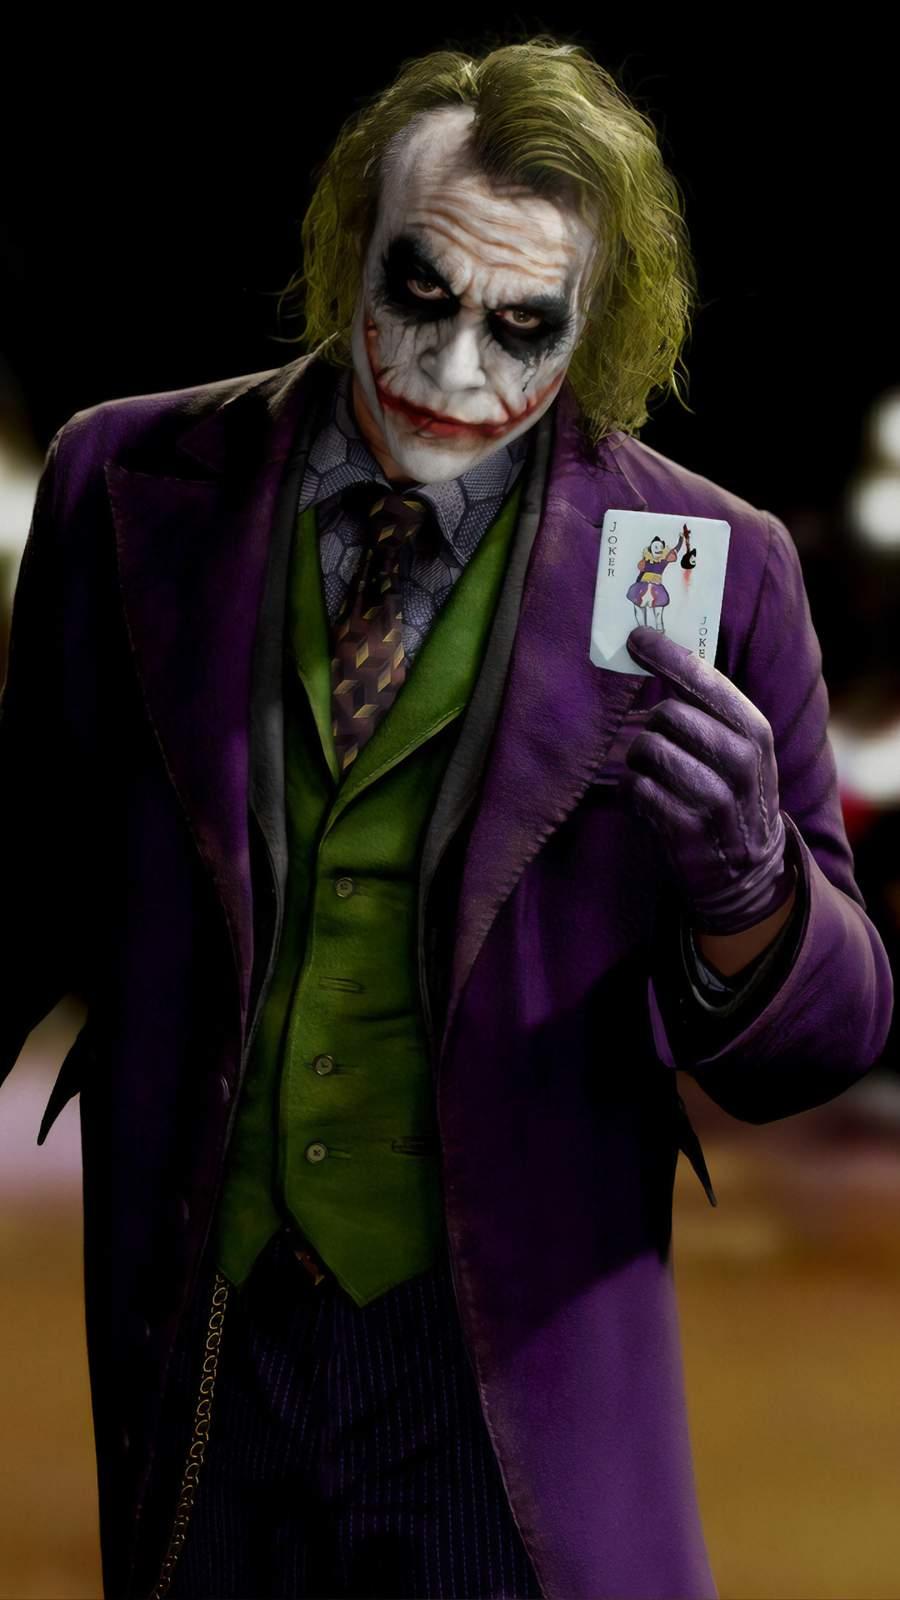 Joker with Card iPhone Wallpaper